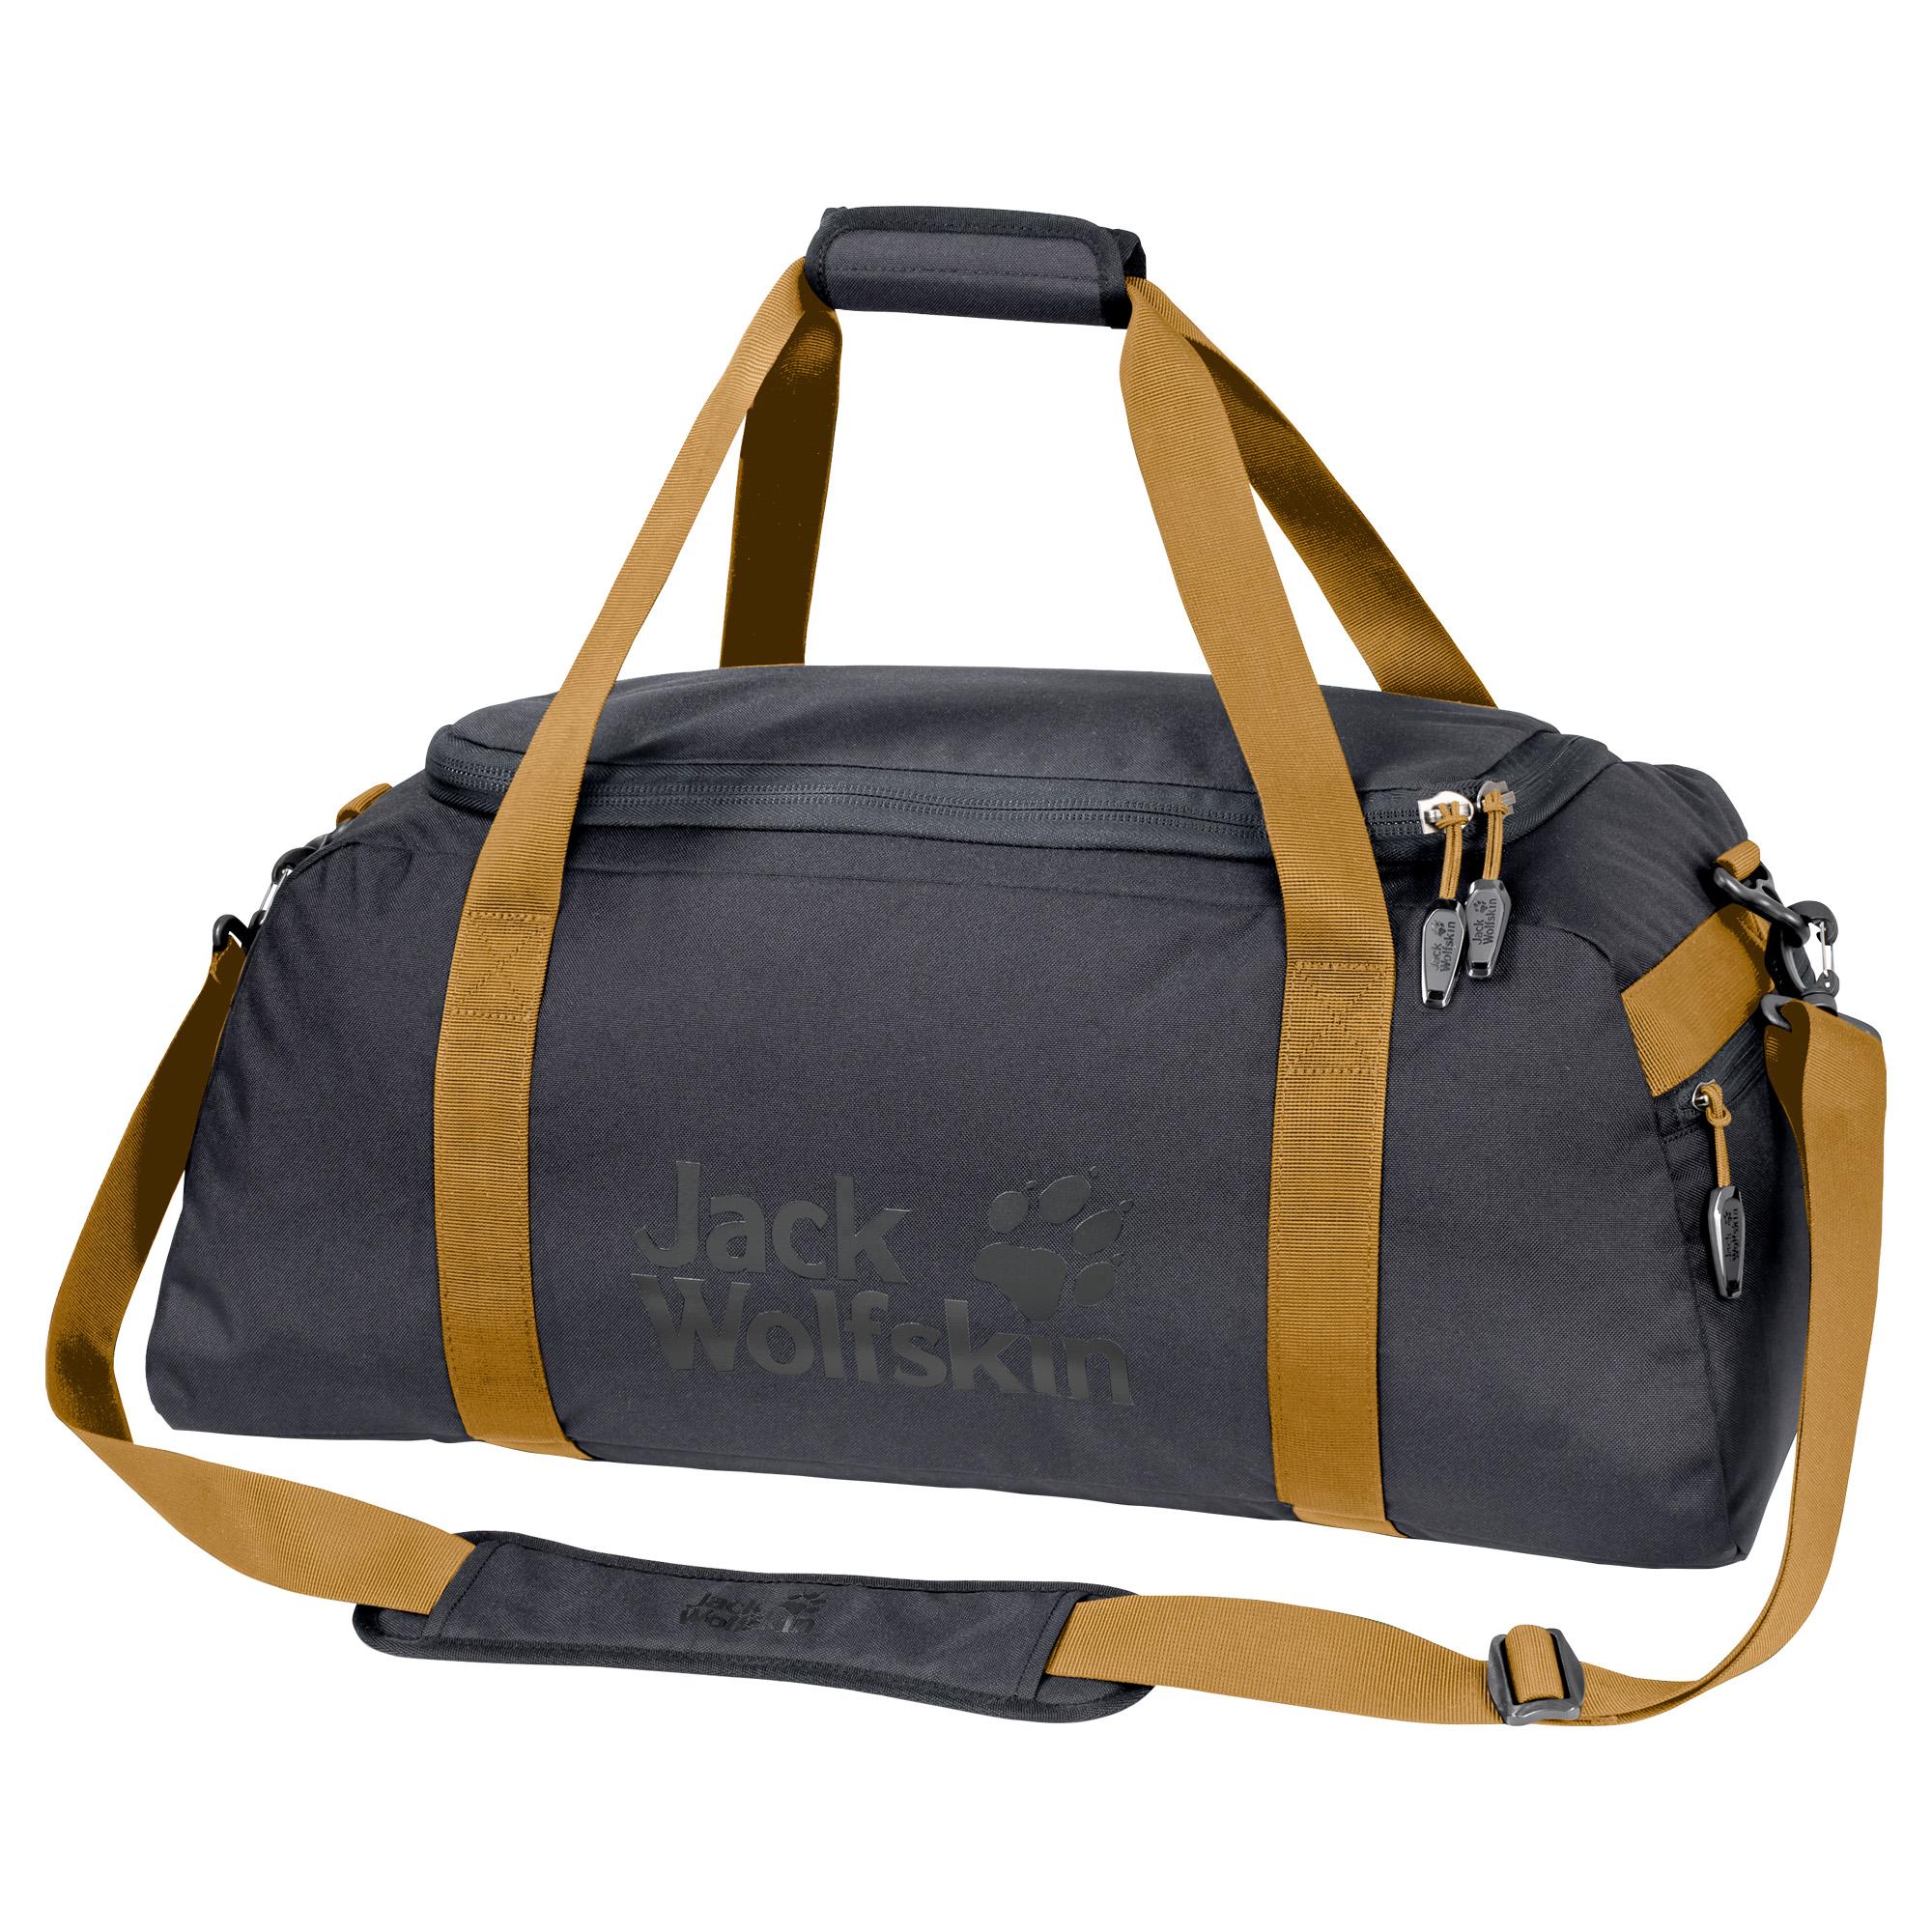 jack-wolfskin-action-bag-45-sporttasche-farbe-6230-ebony-